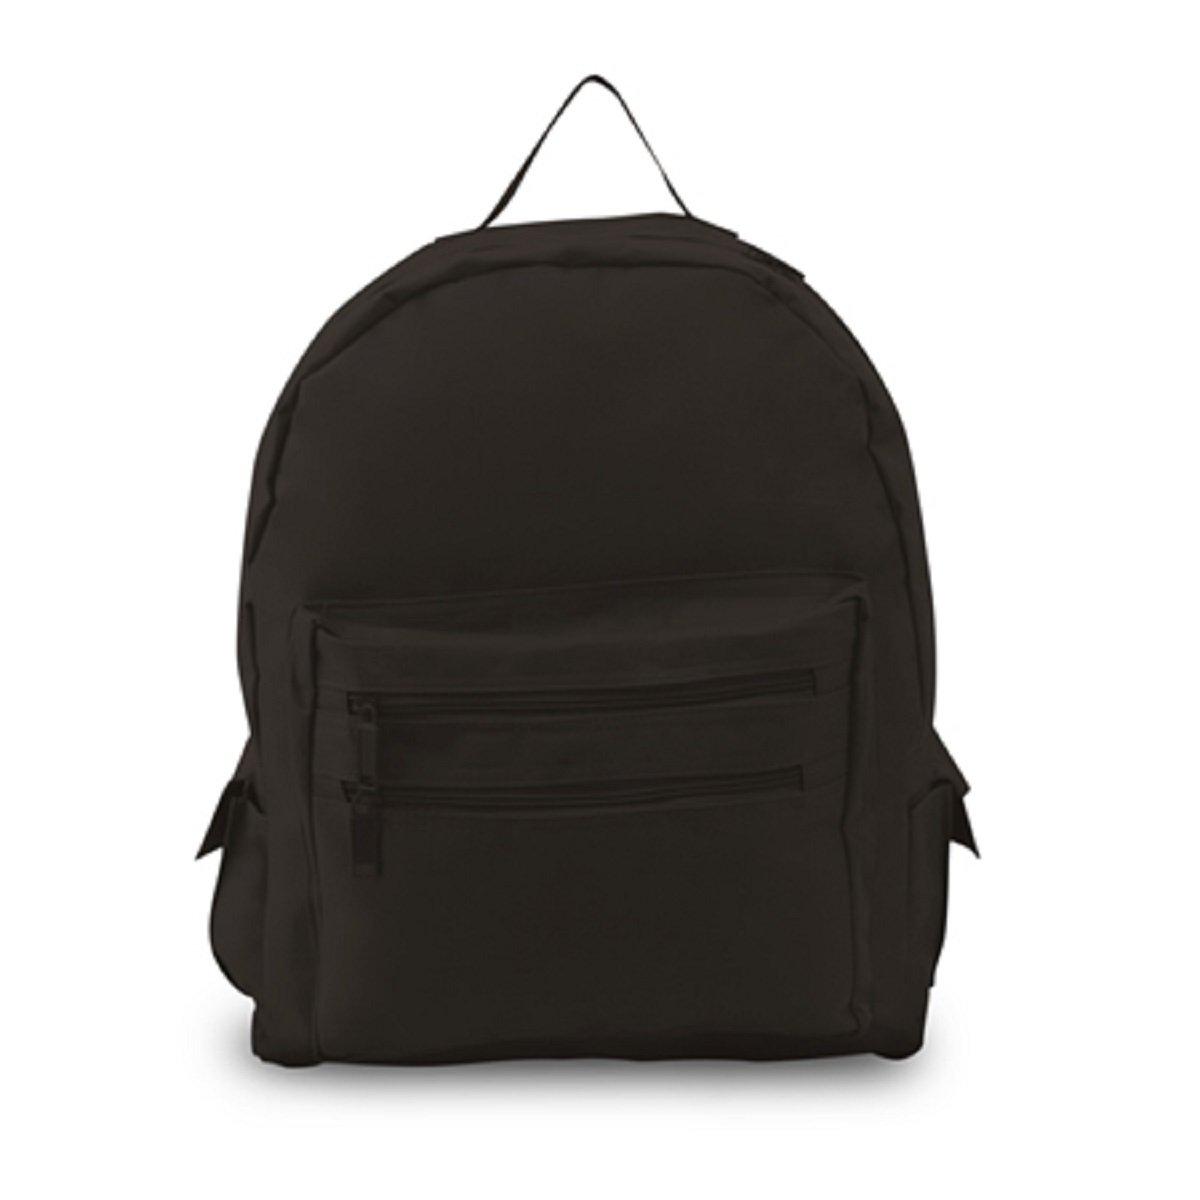 BACKPACK ON A BUDGET, Black, Case of 12